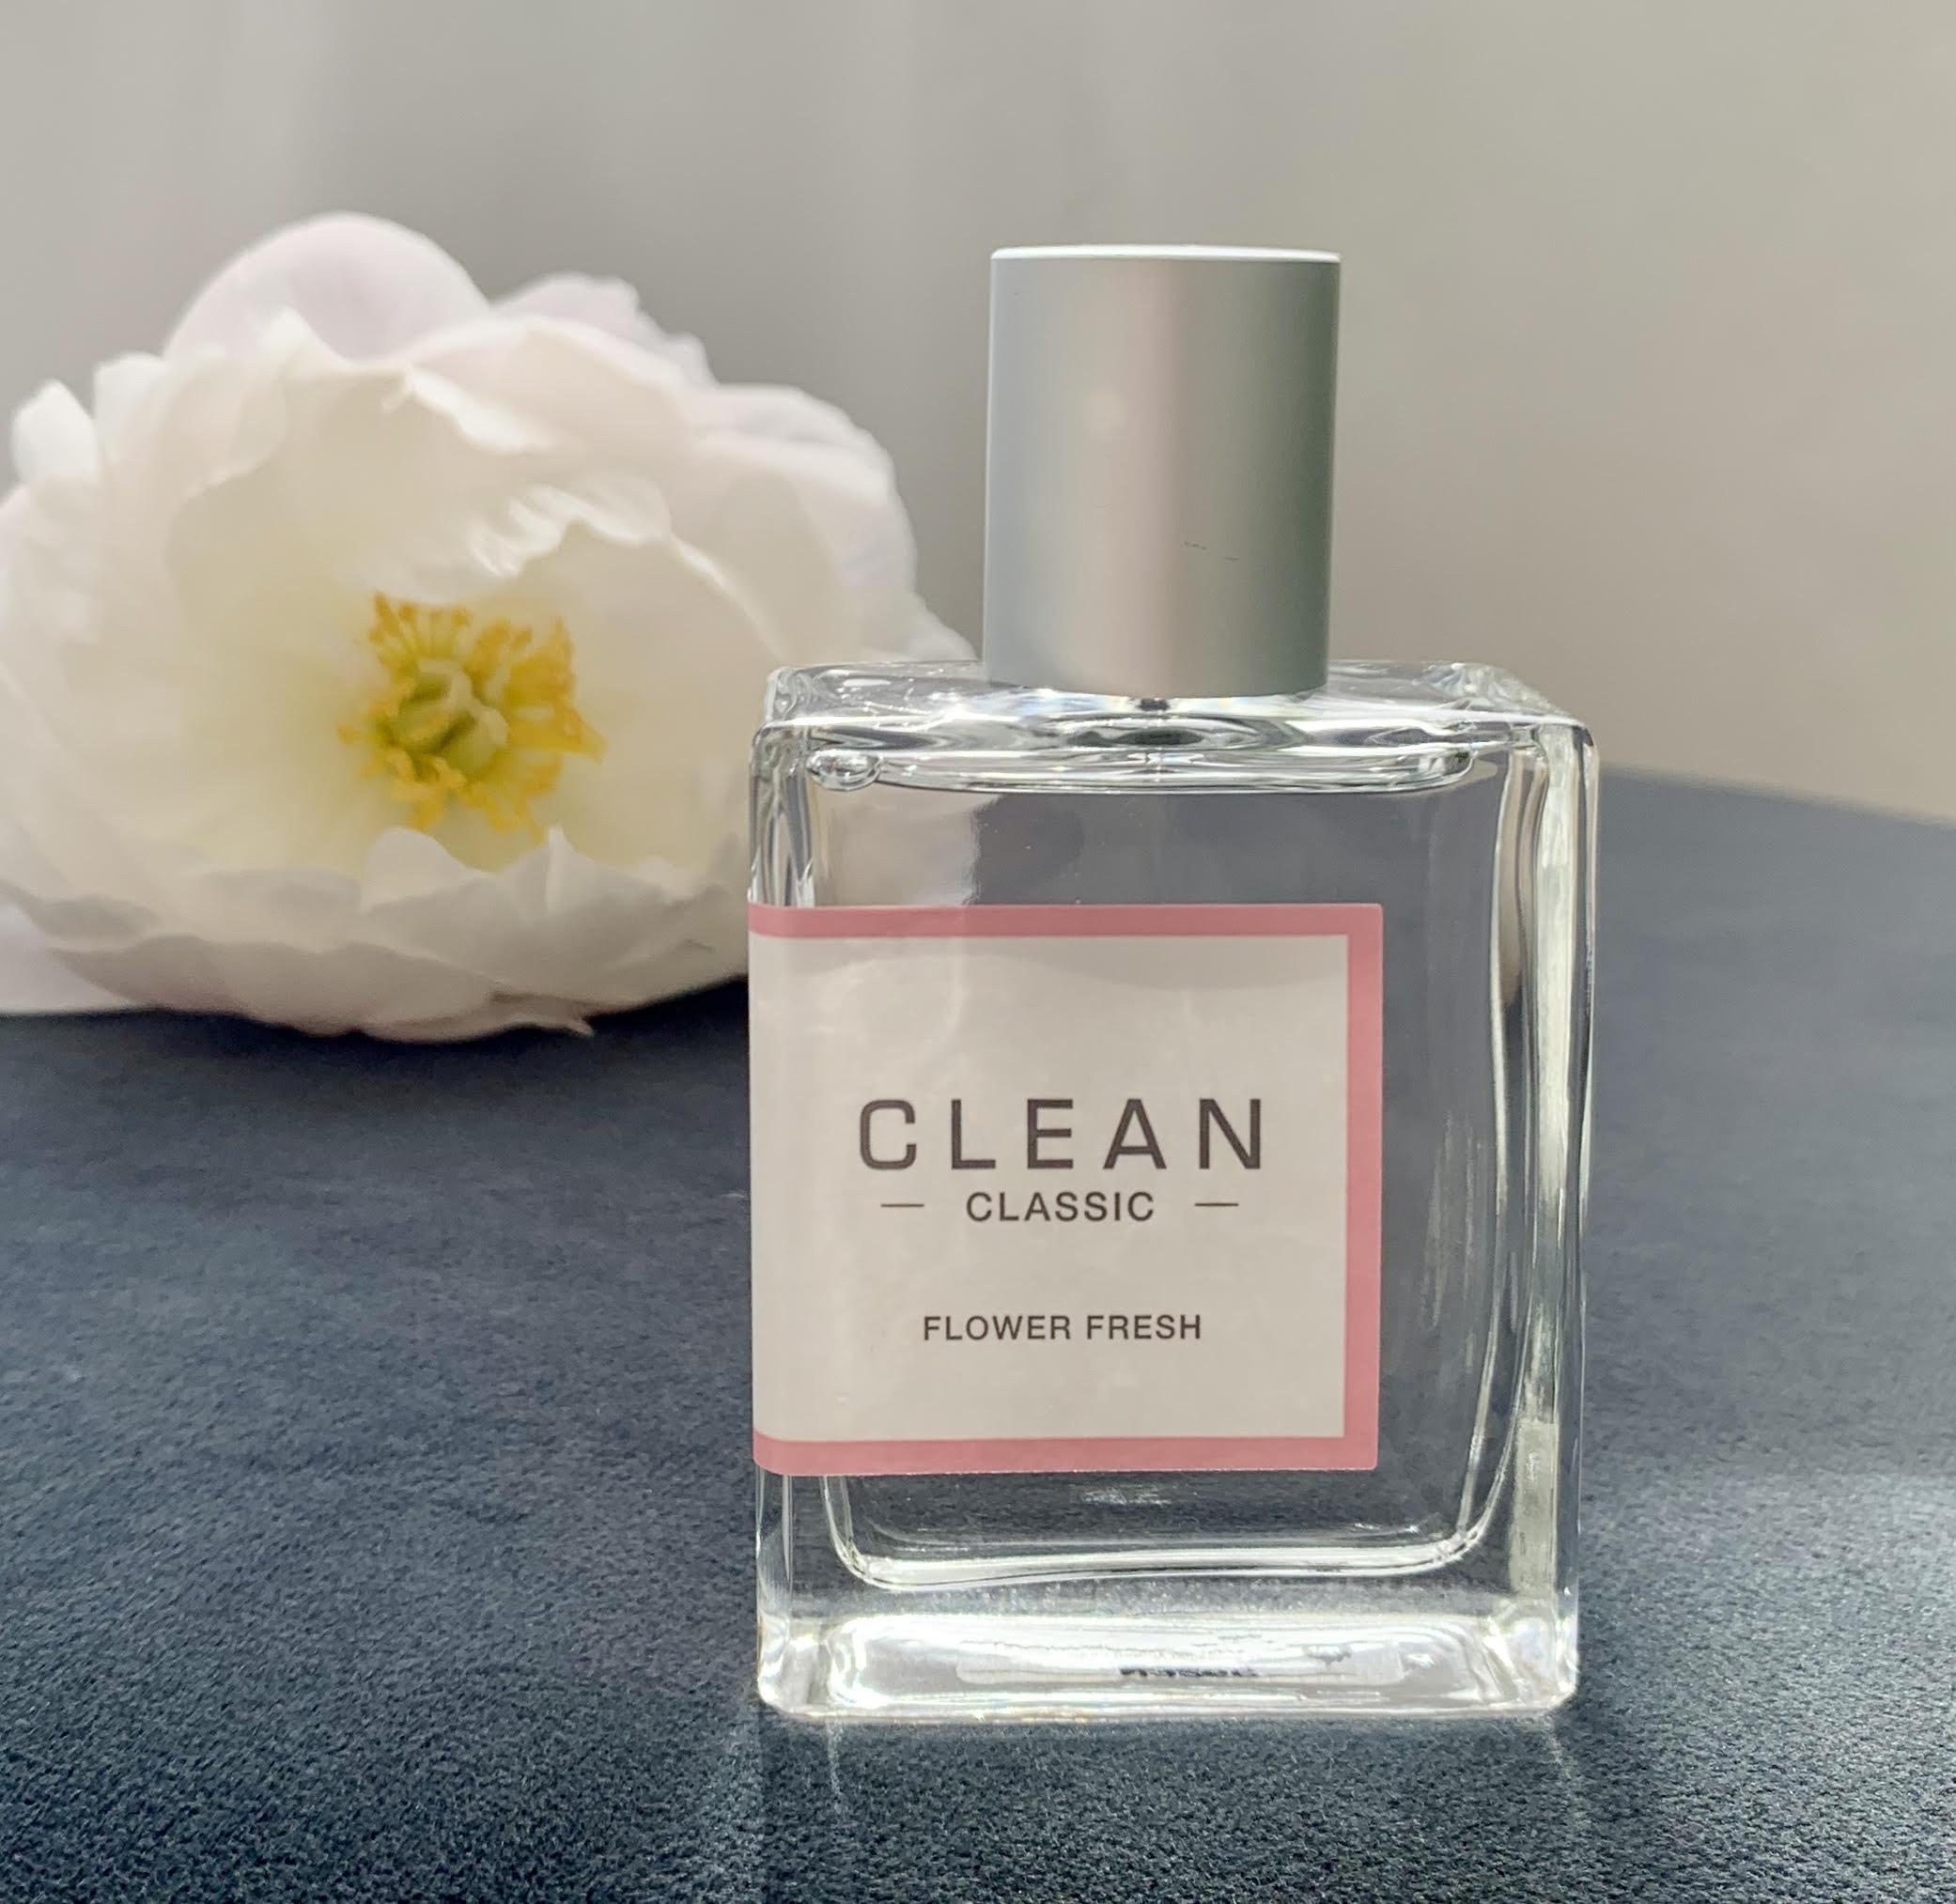 Parfume, sommerparfumer, lette dufte, Flower Fresh, Clean